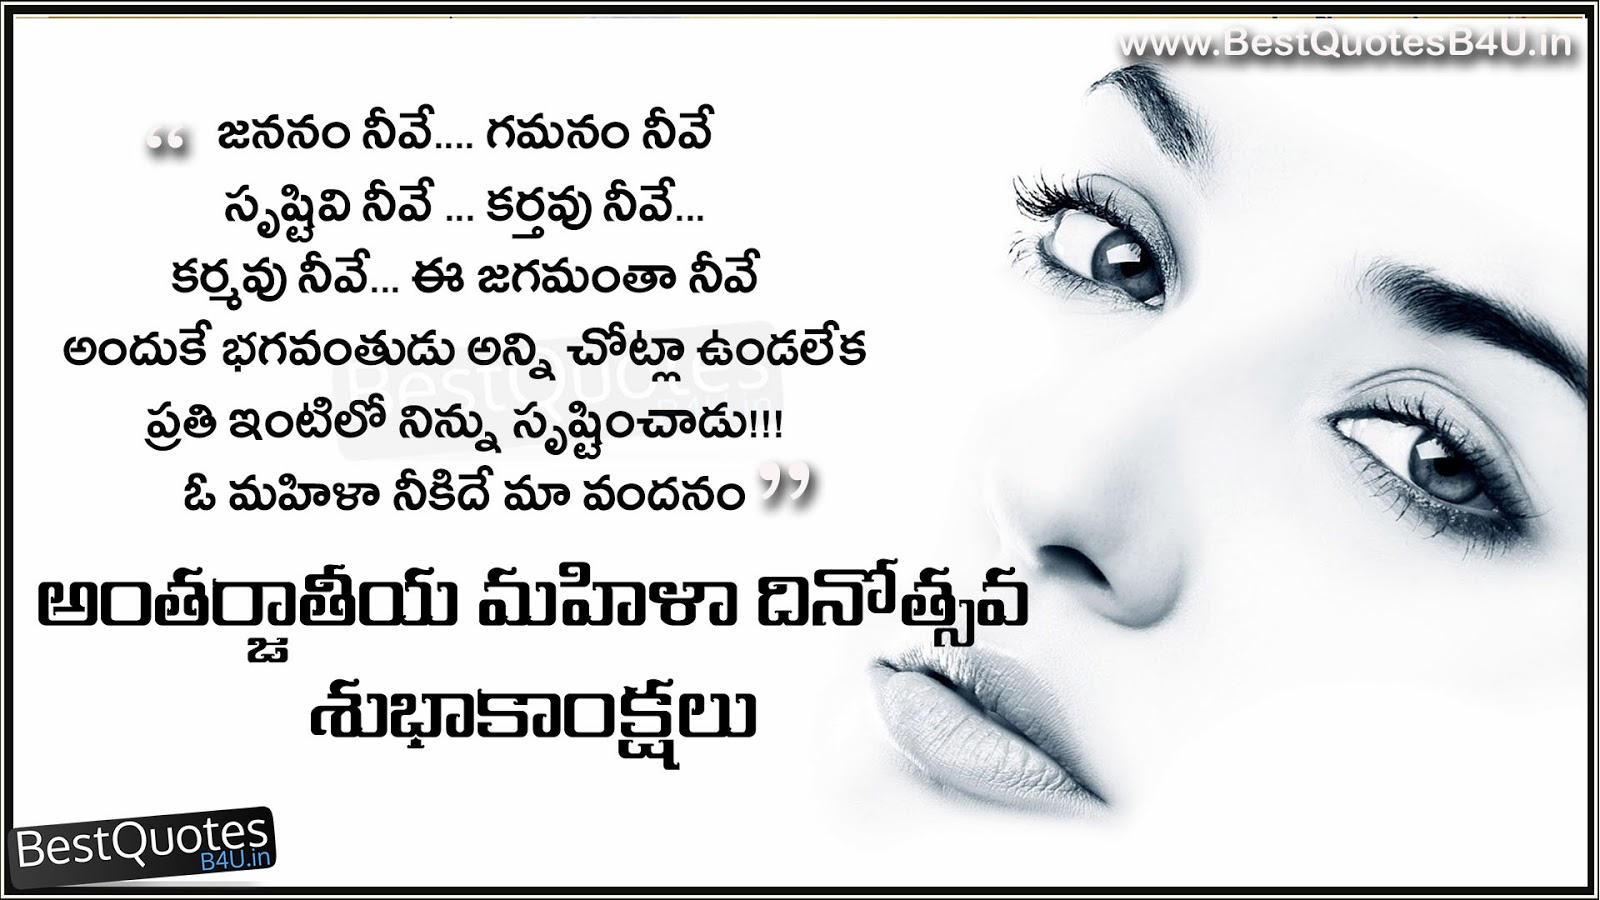 Womens Day Telugu Greetings Quotes Bestquotesb4u English